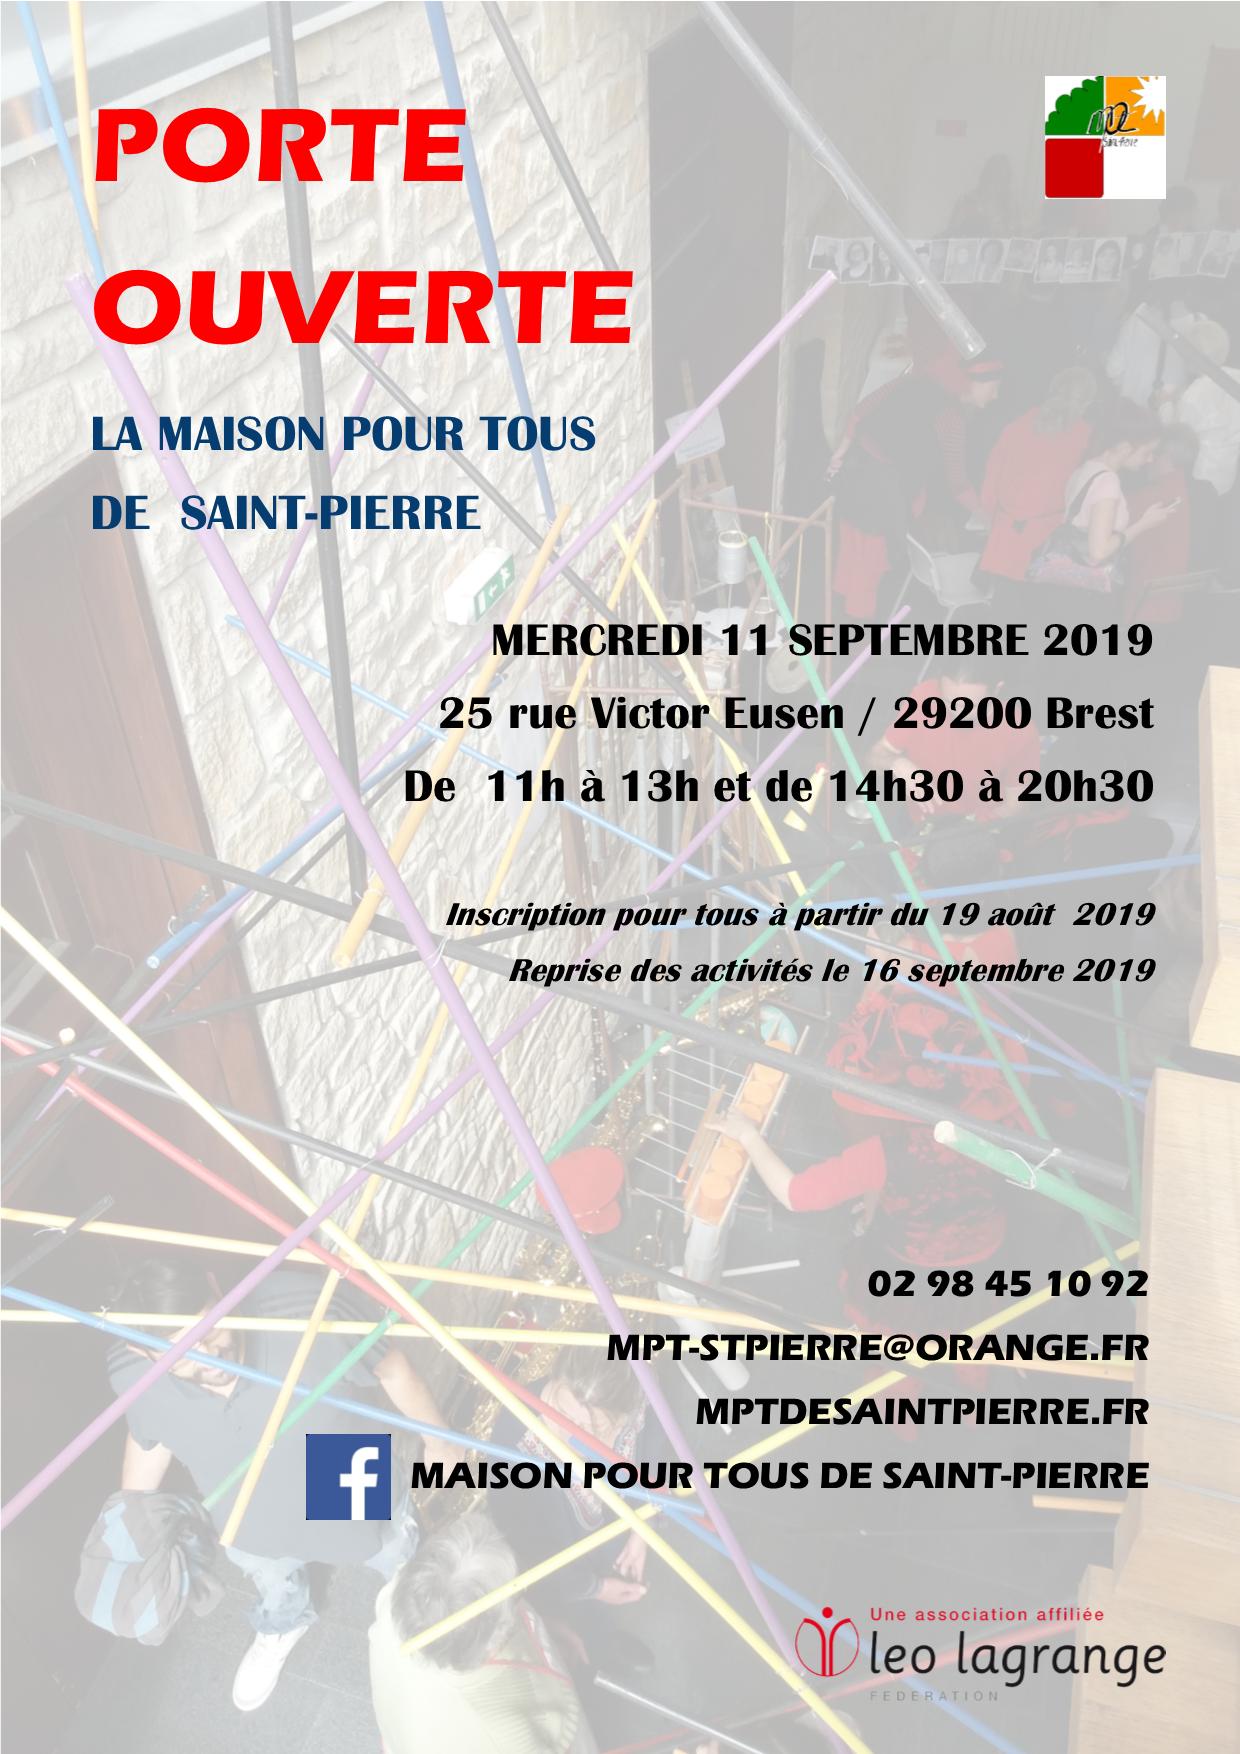 Porte Ouverte 2019